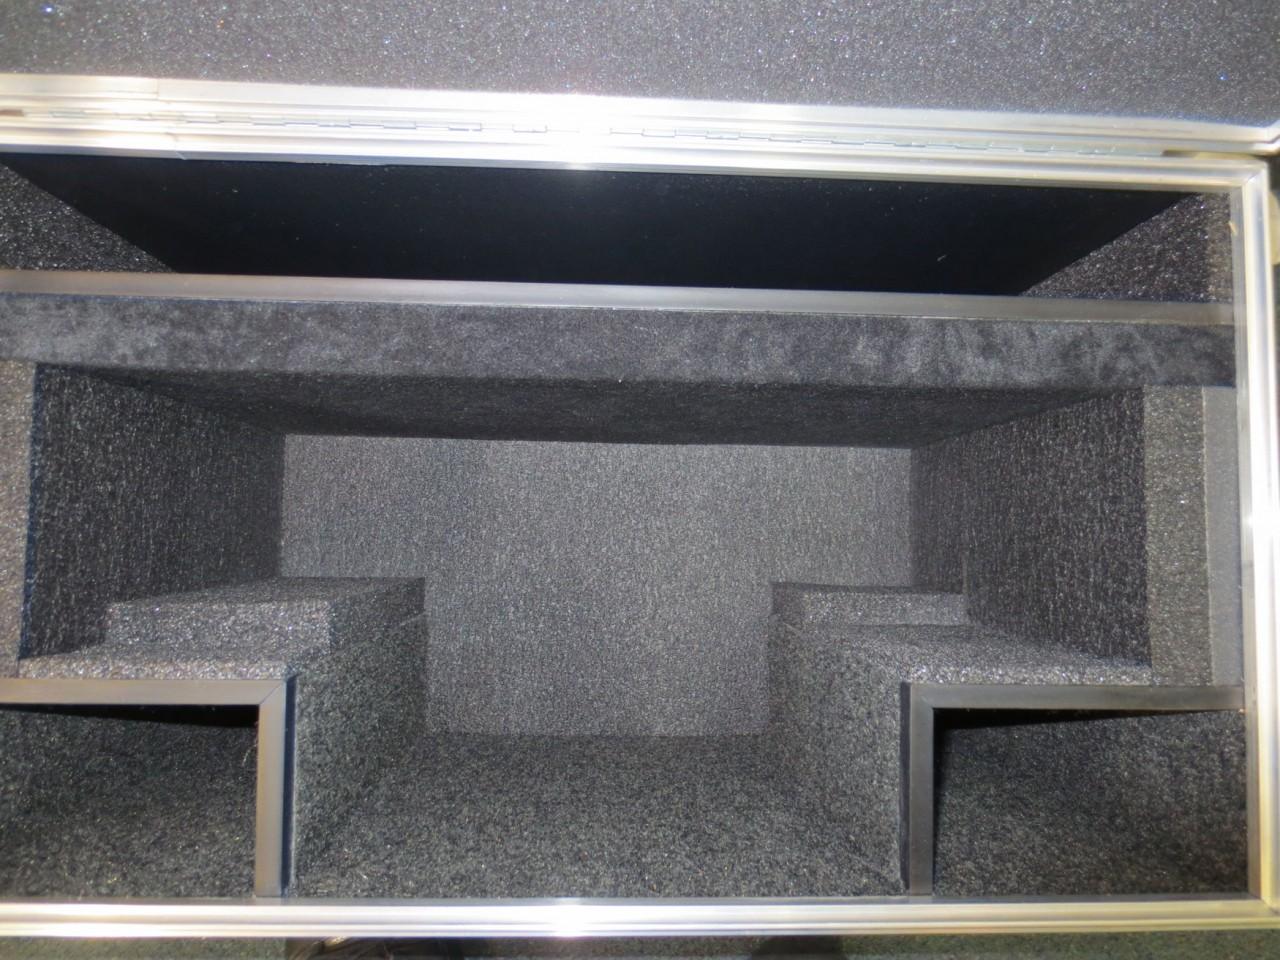 Sony PVM-1741 OLED Shipping Case